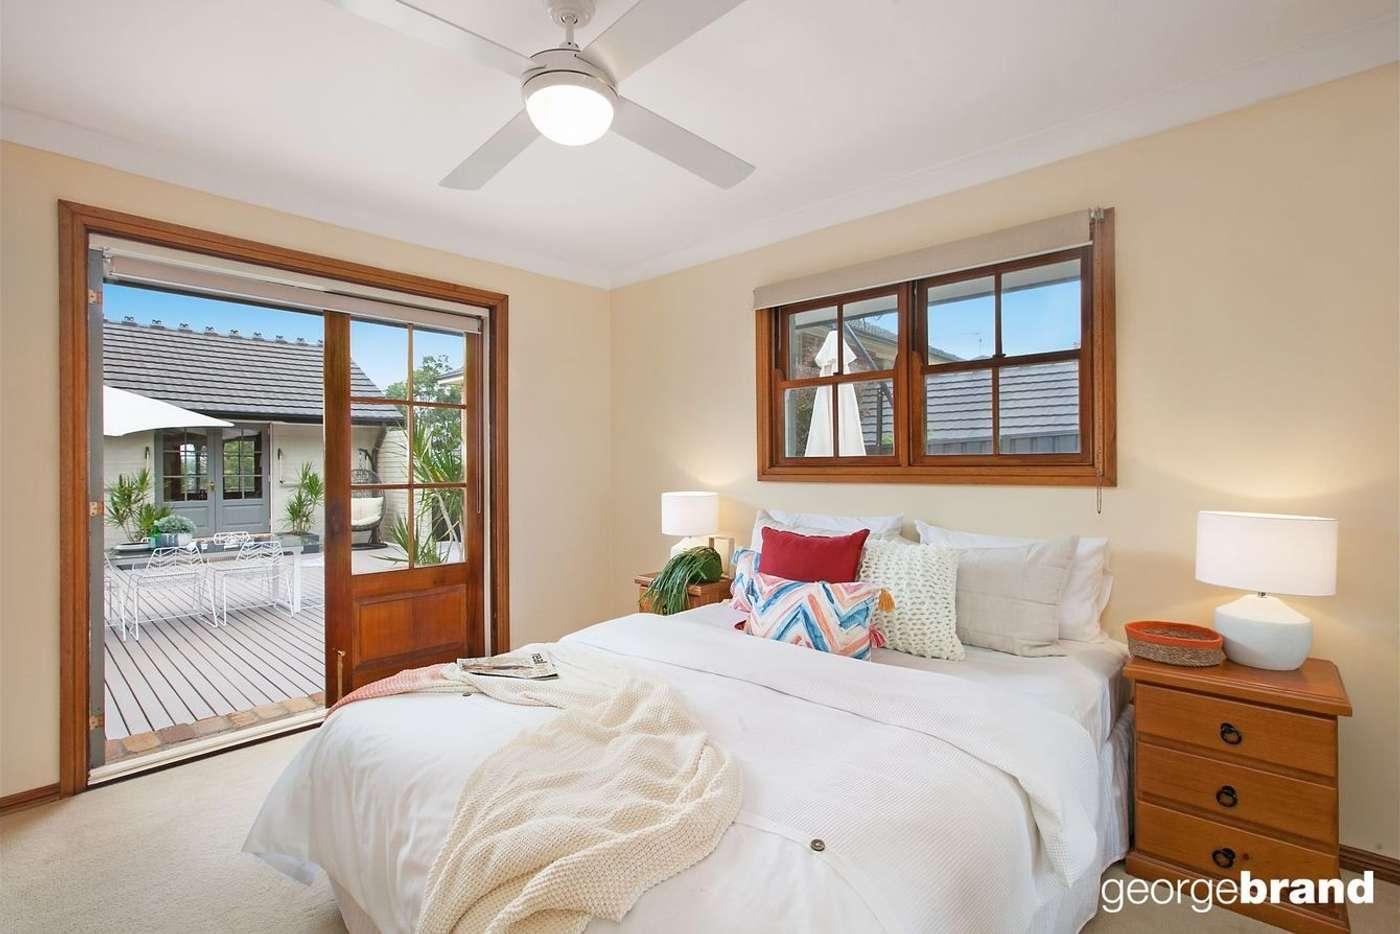 Seventh view of Homely house listing, 40 Kookaburra Street, Kincumber NSW 2251